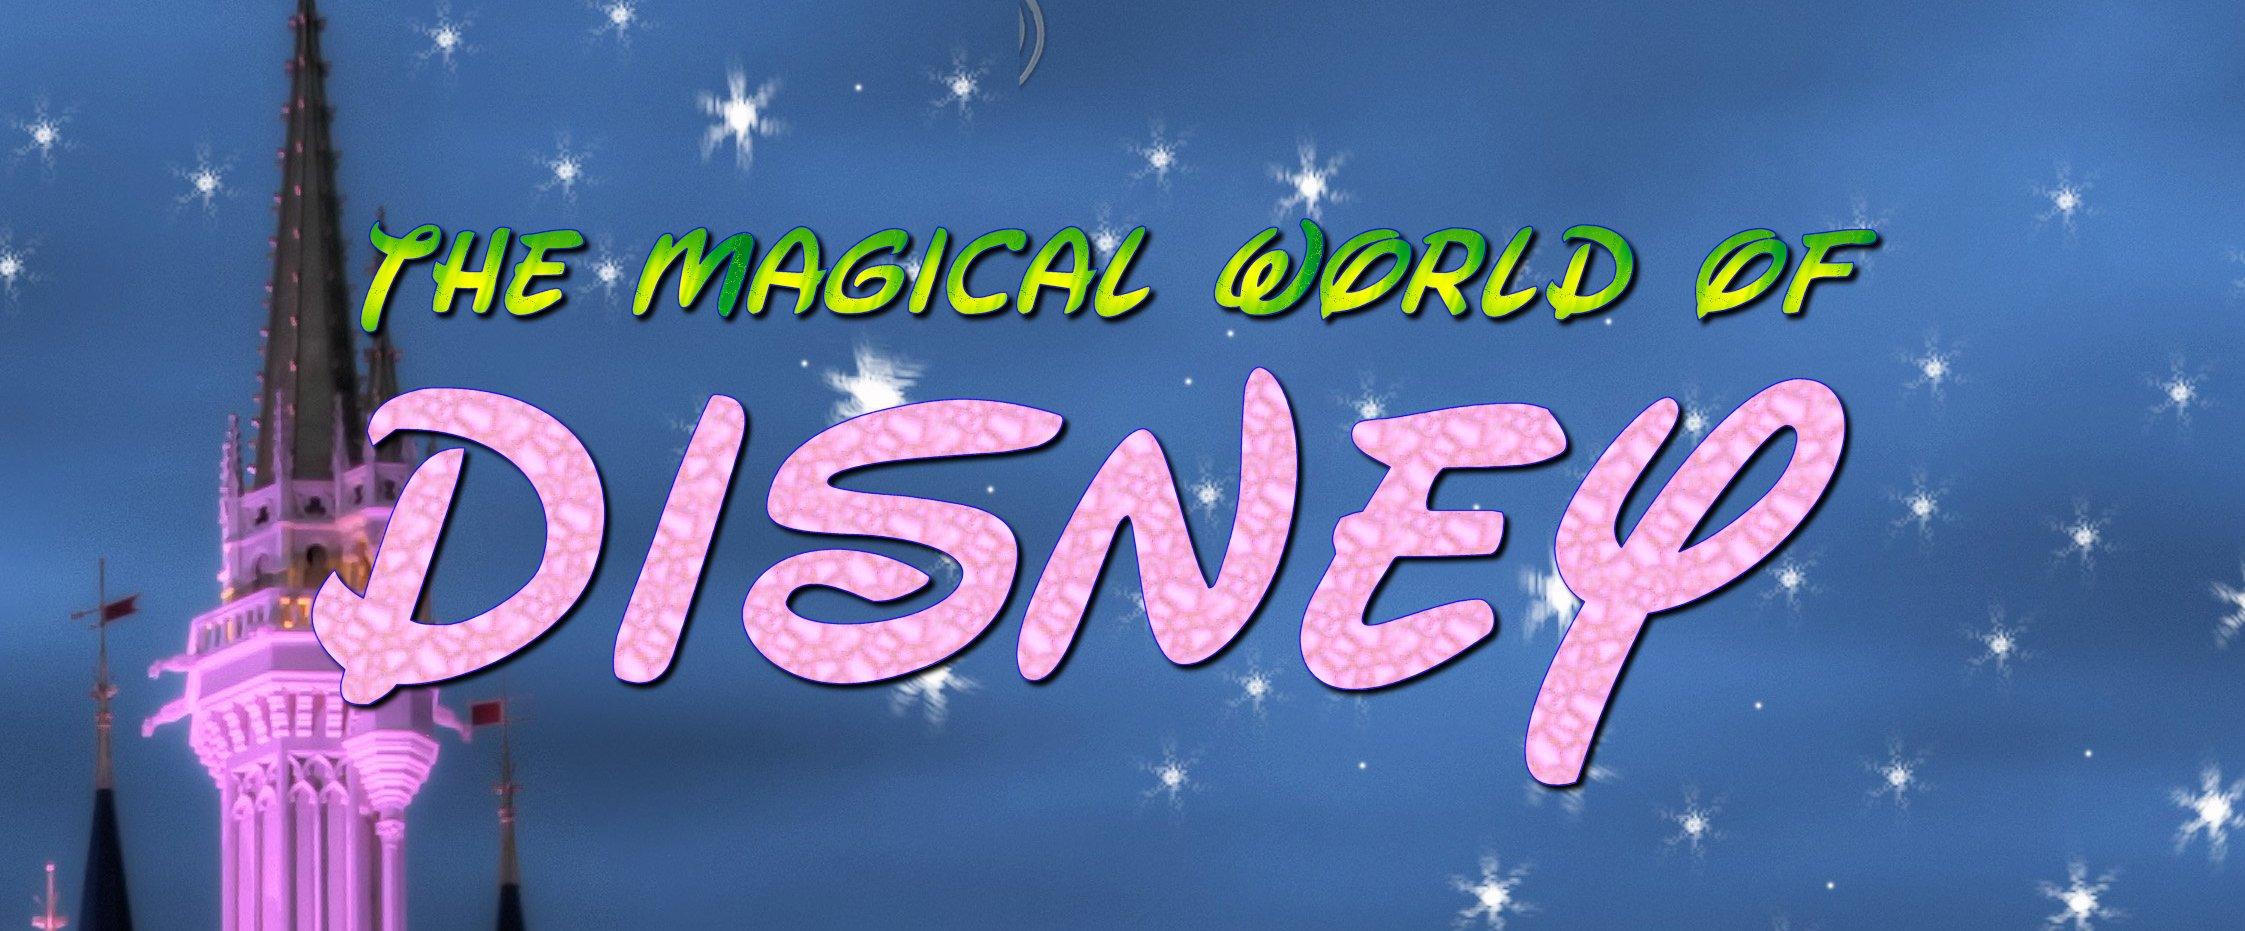 Disney-poster-long-post